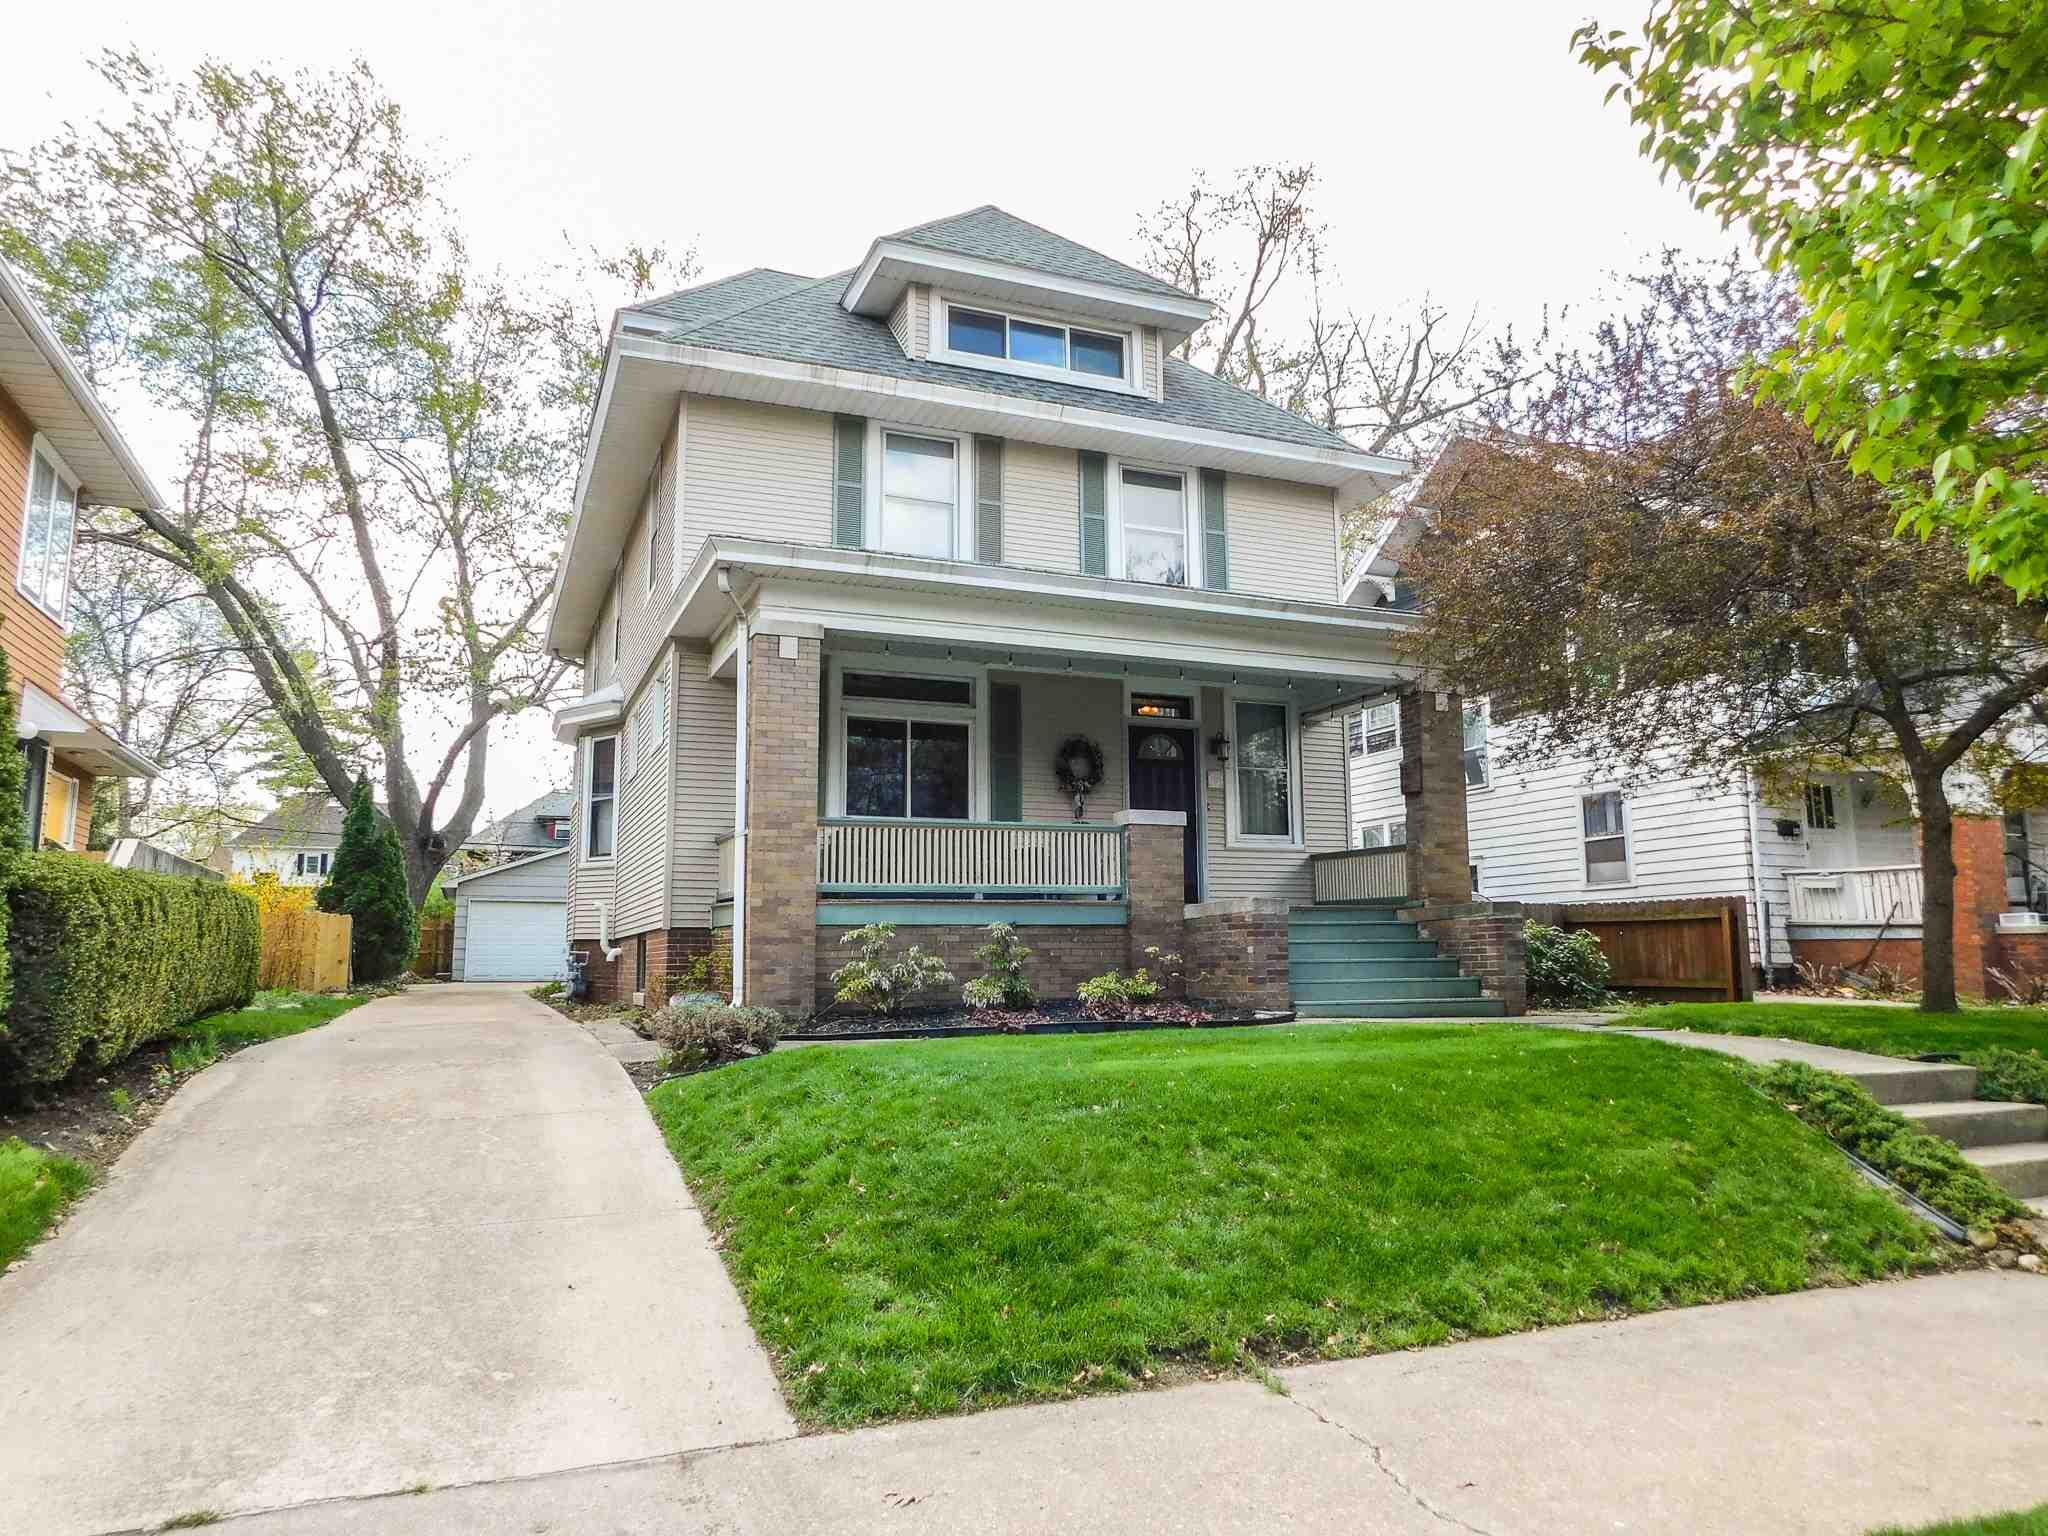 1612 W CALLENDER Property Photo - Peoria, IL real estate listing